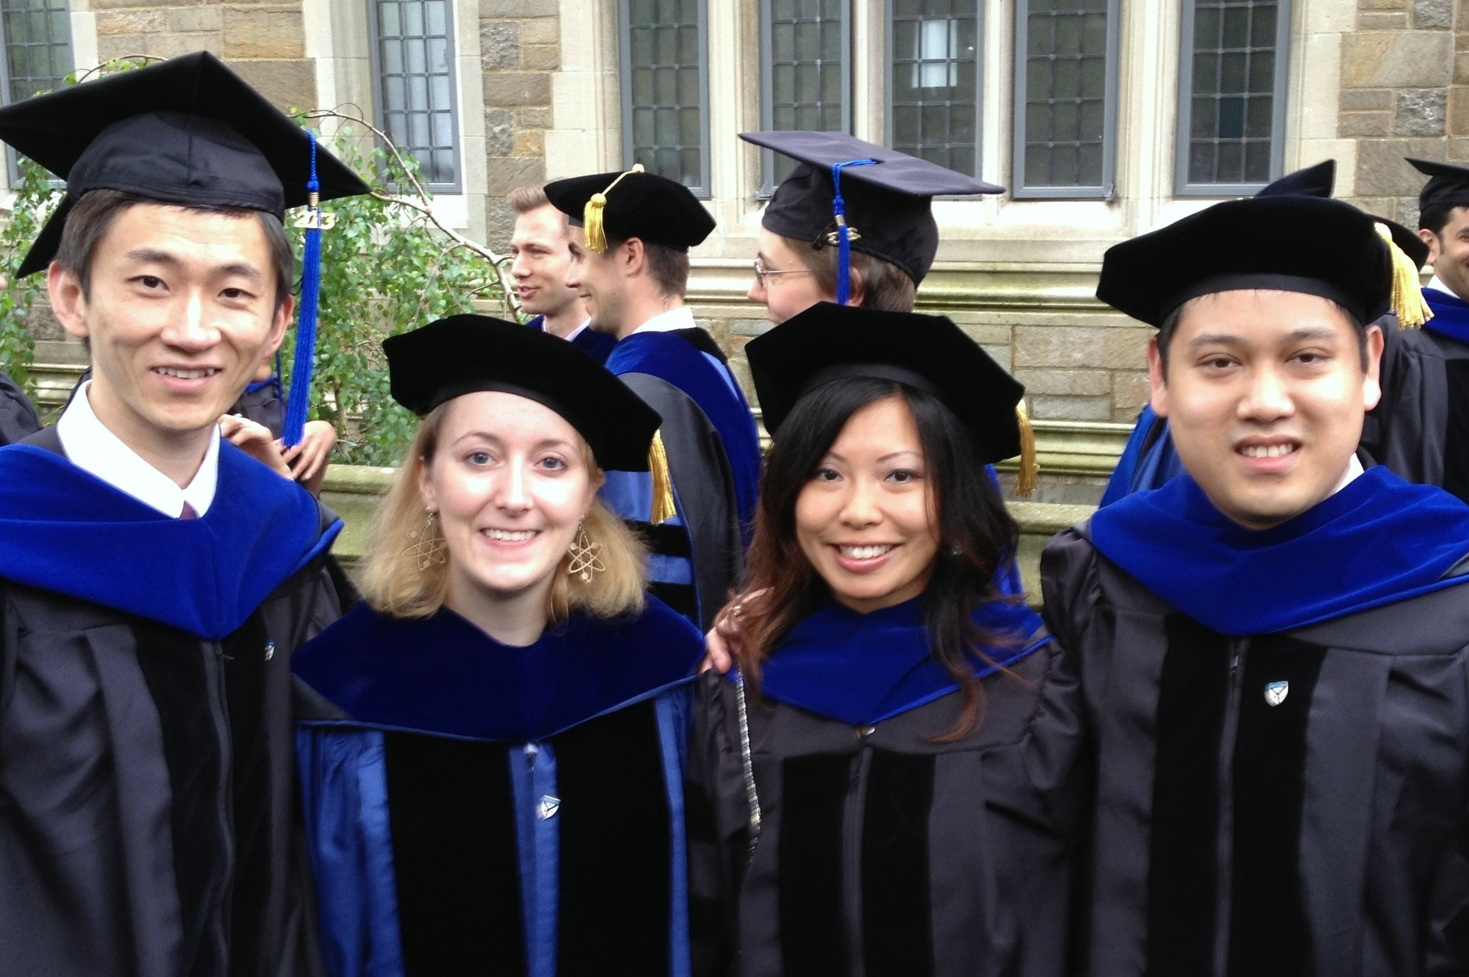 Phd dissertations online yale